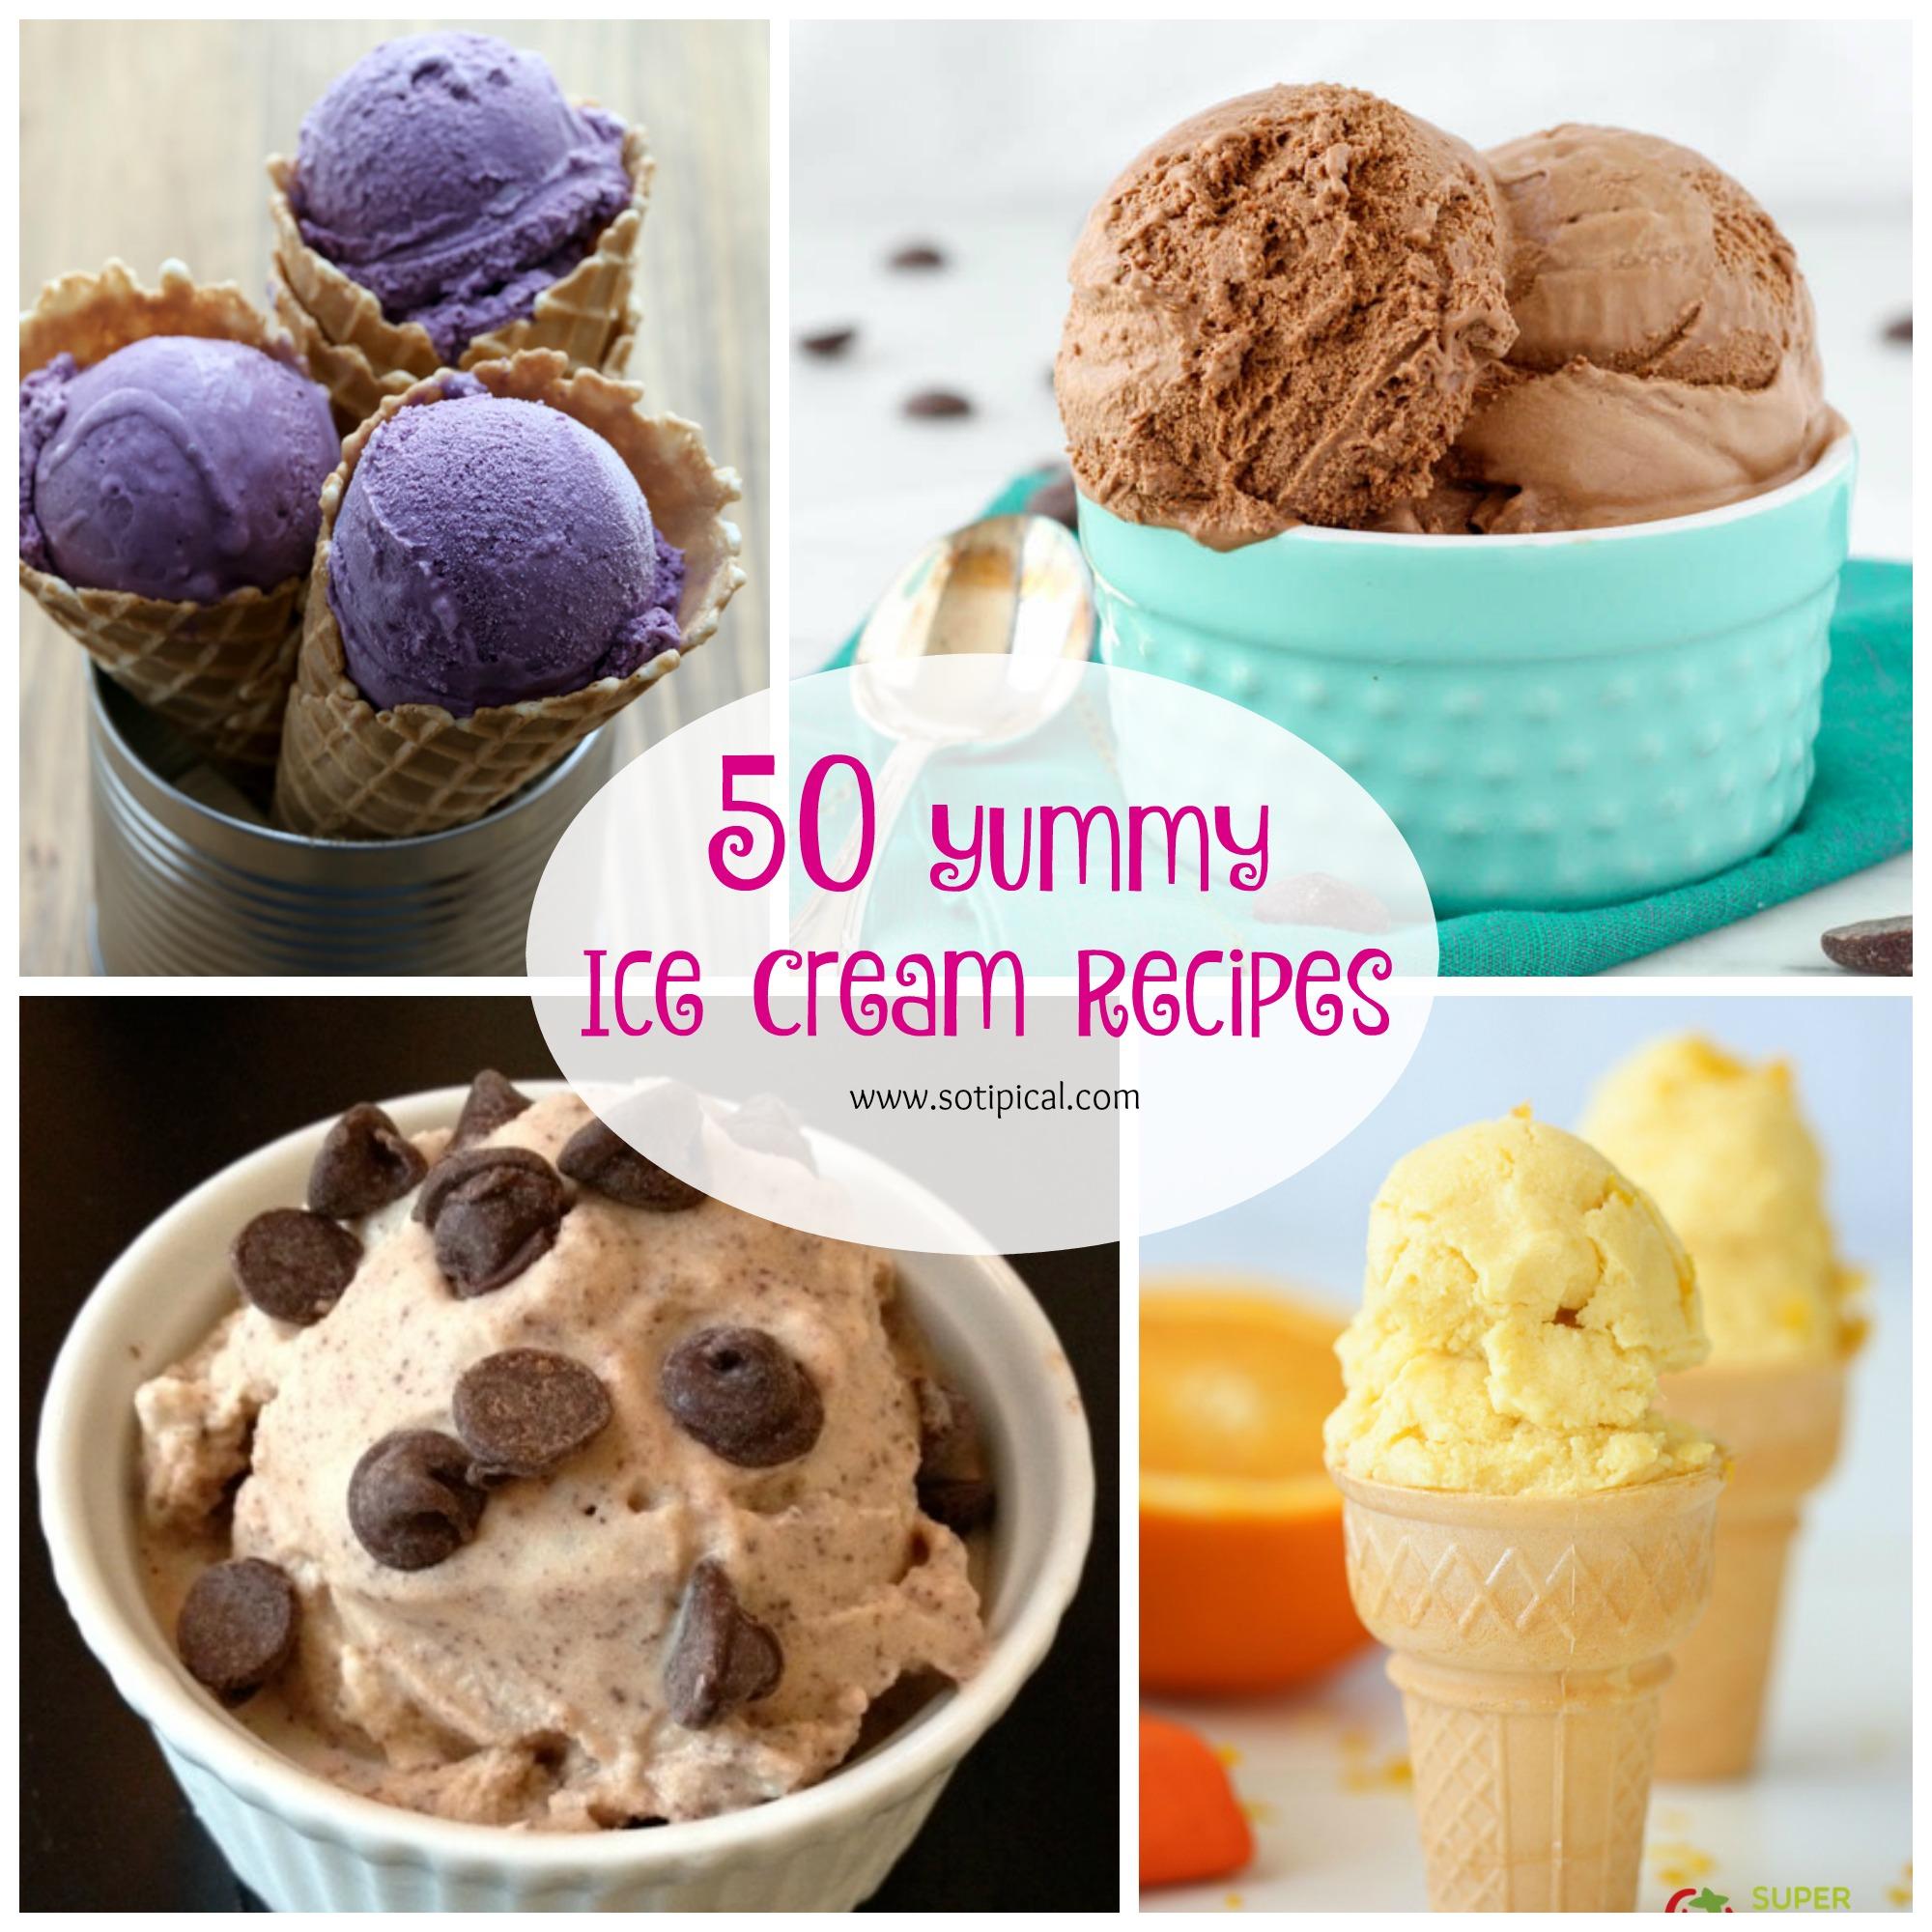 50 Yummy Ice Cream Recipes